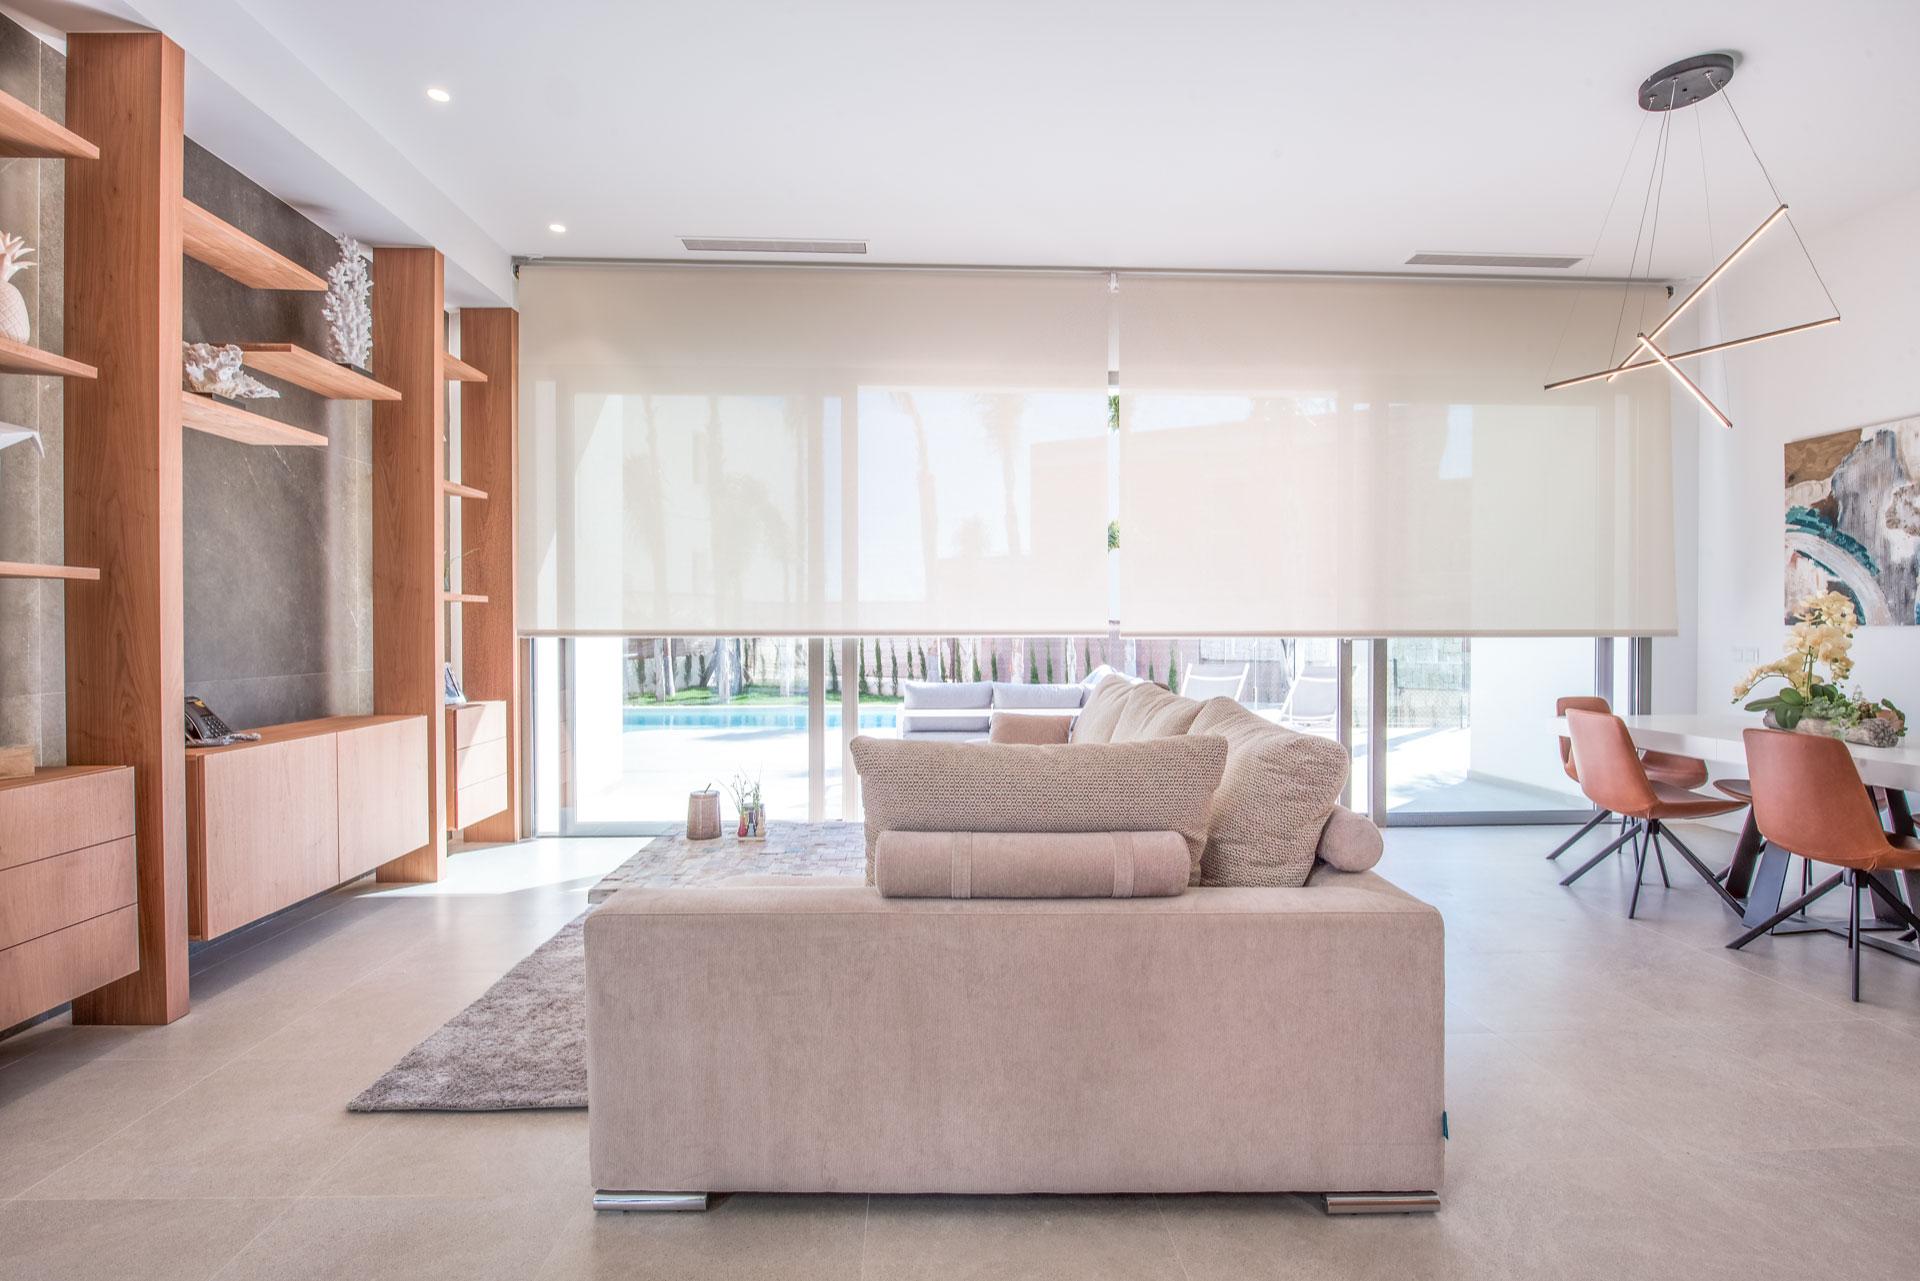 4 bedroom villa For Sale in Finestrat - photograph 4